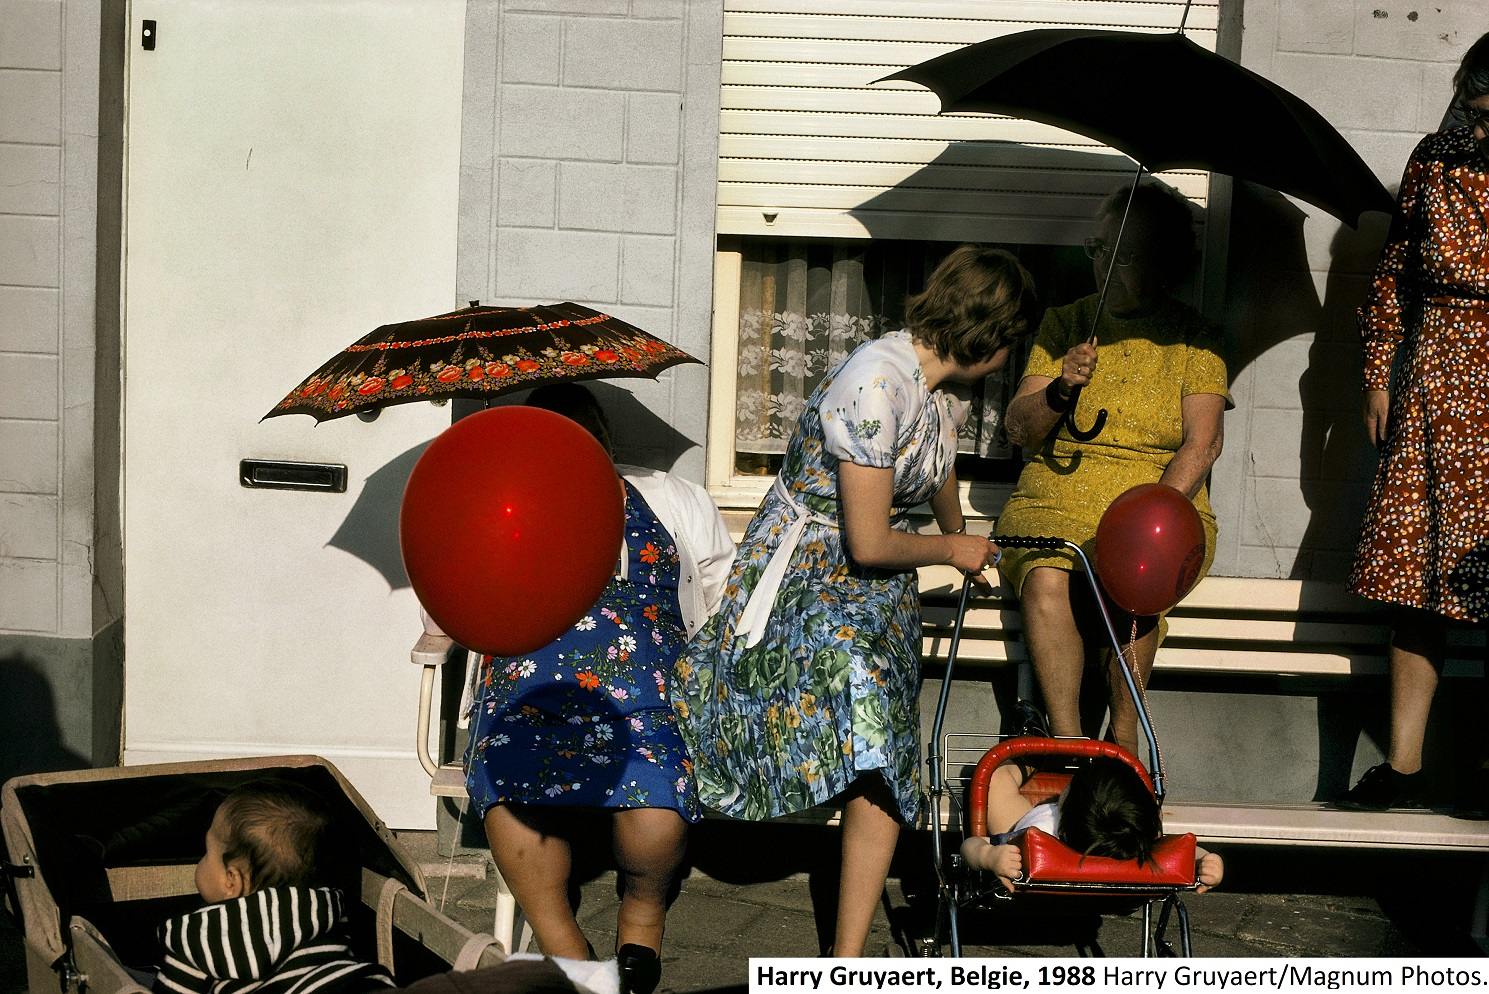 Rondleiding Fototentoonstelling Harry Gruyaert. Retrospective in Museum Helmond